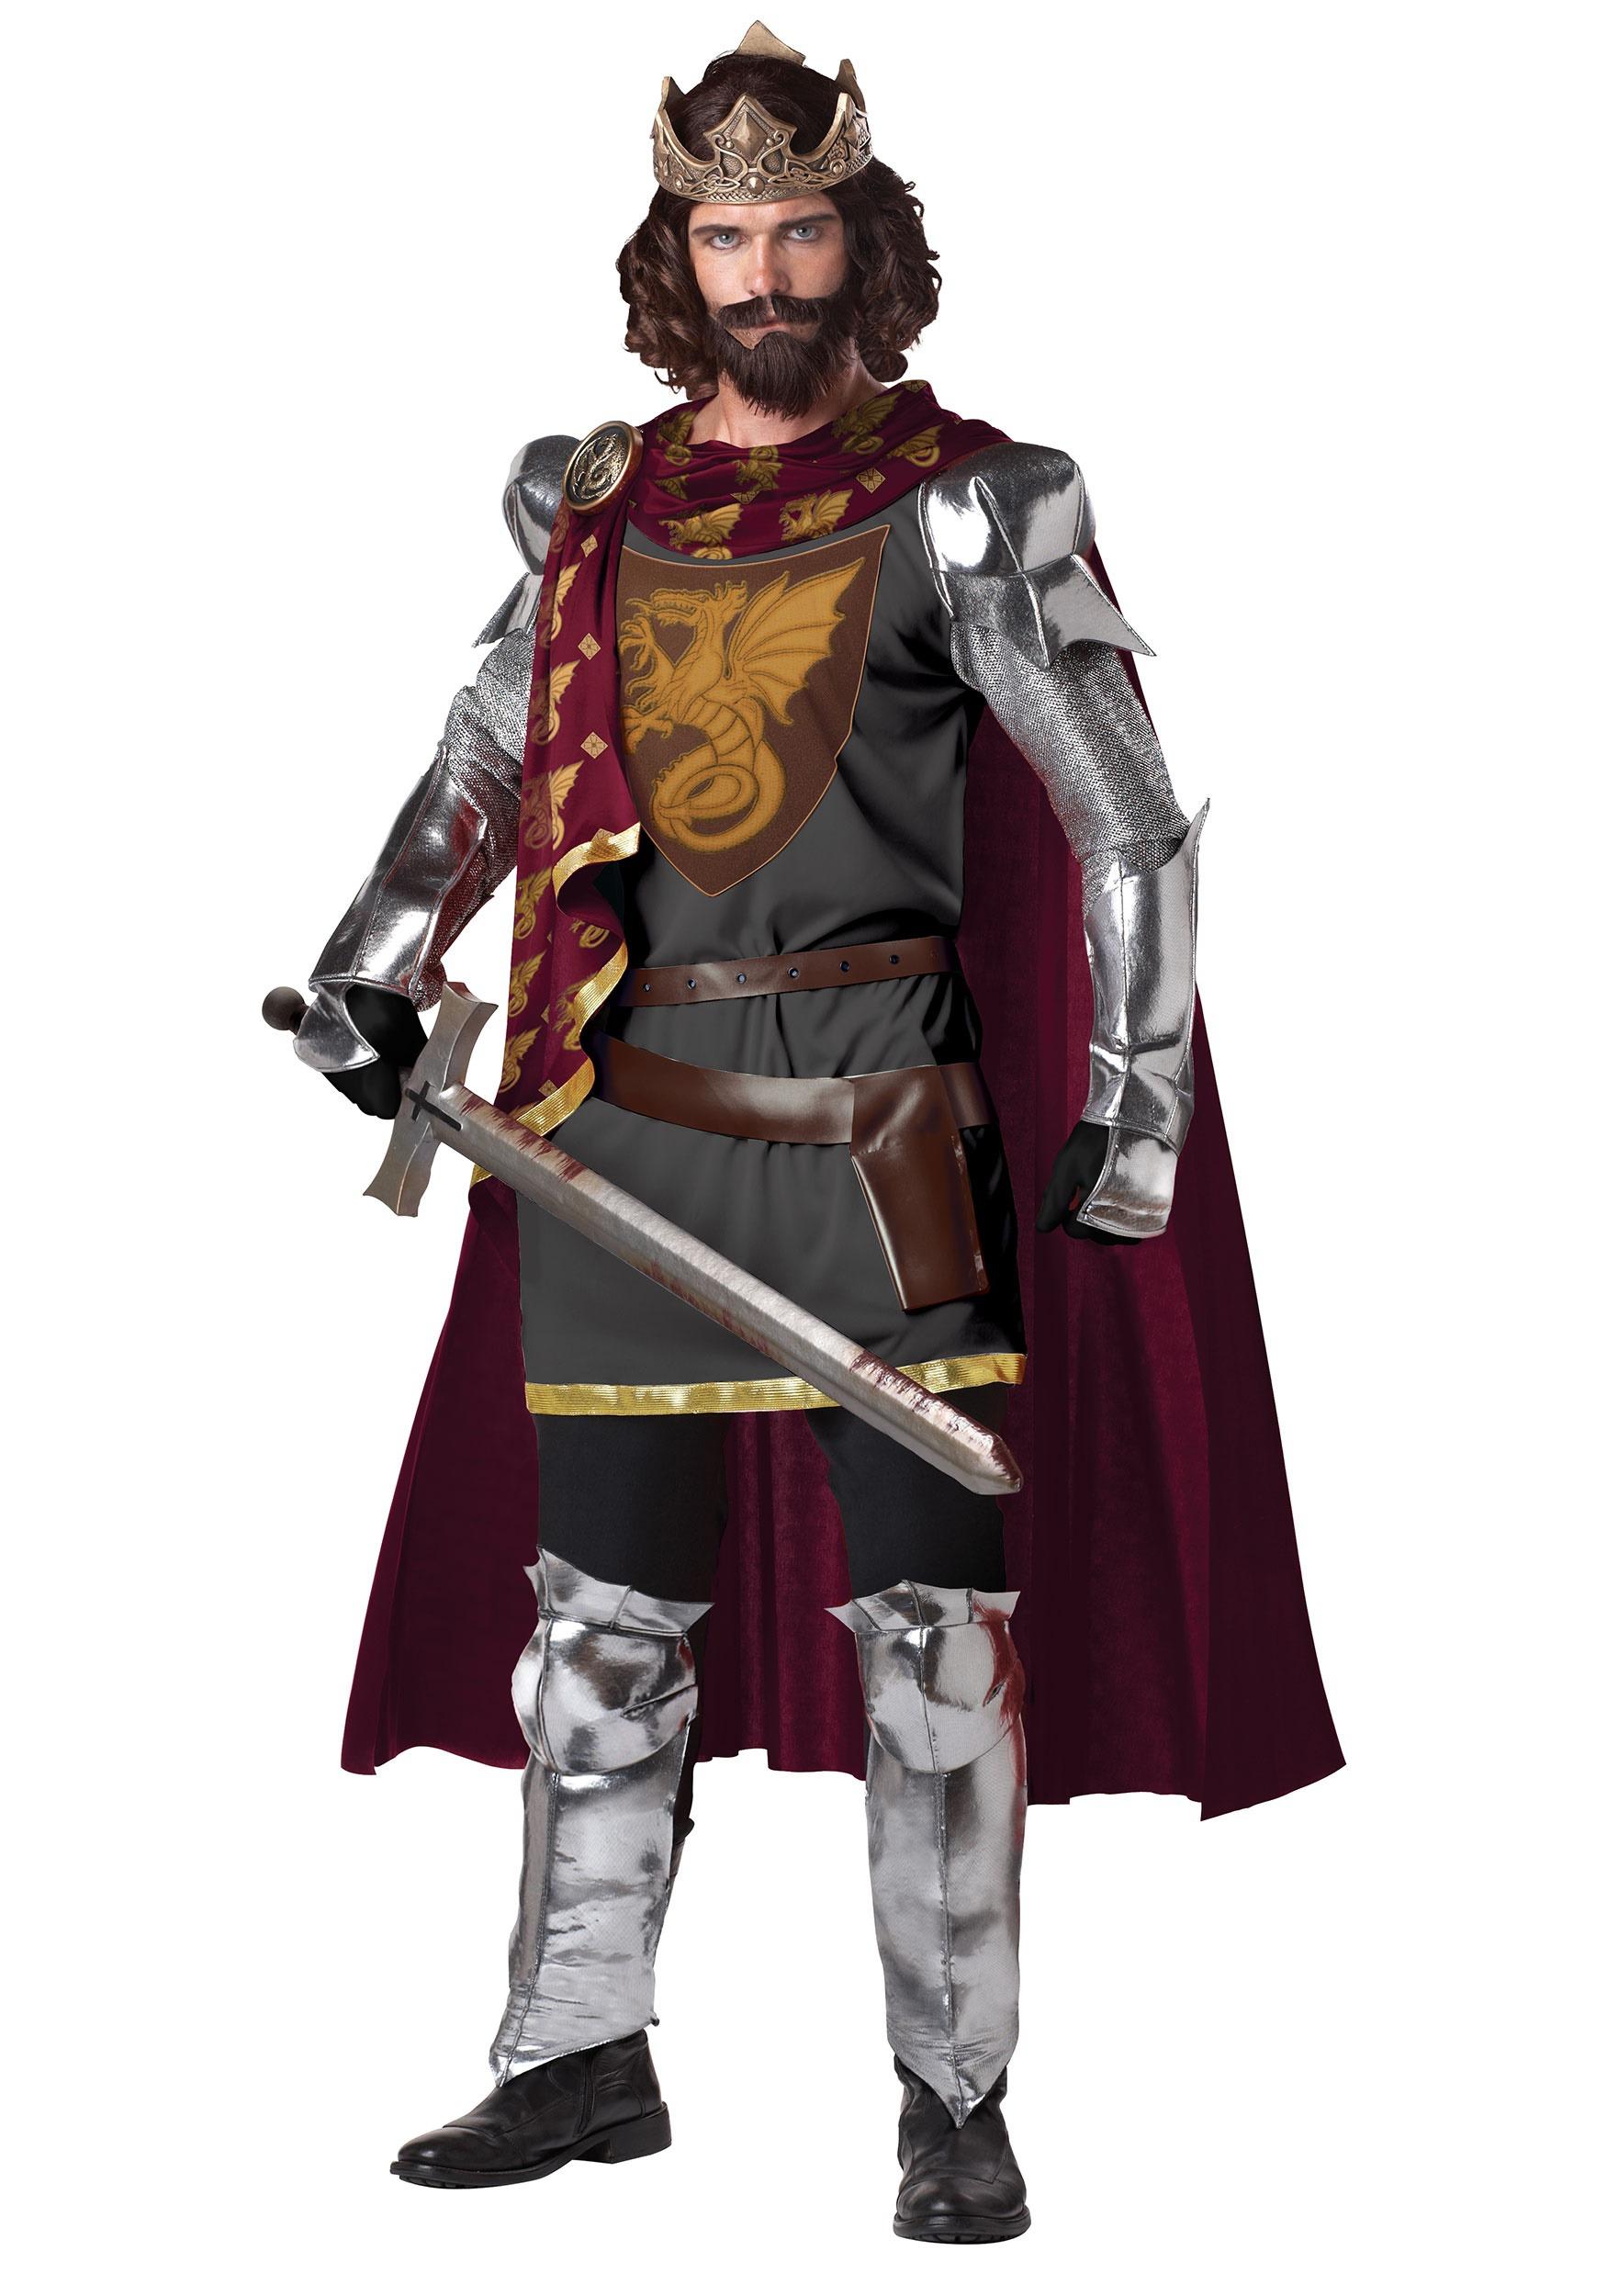 Sheath New Fancy Dress Historical Medieval Arthur Plastic Toy Excalibur Sword